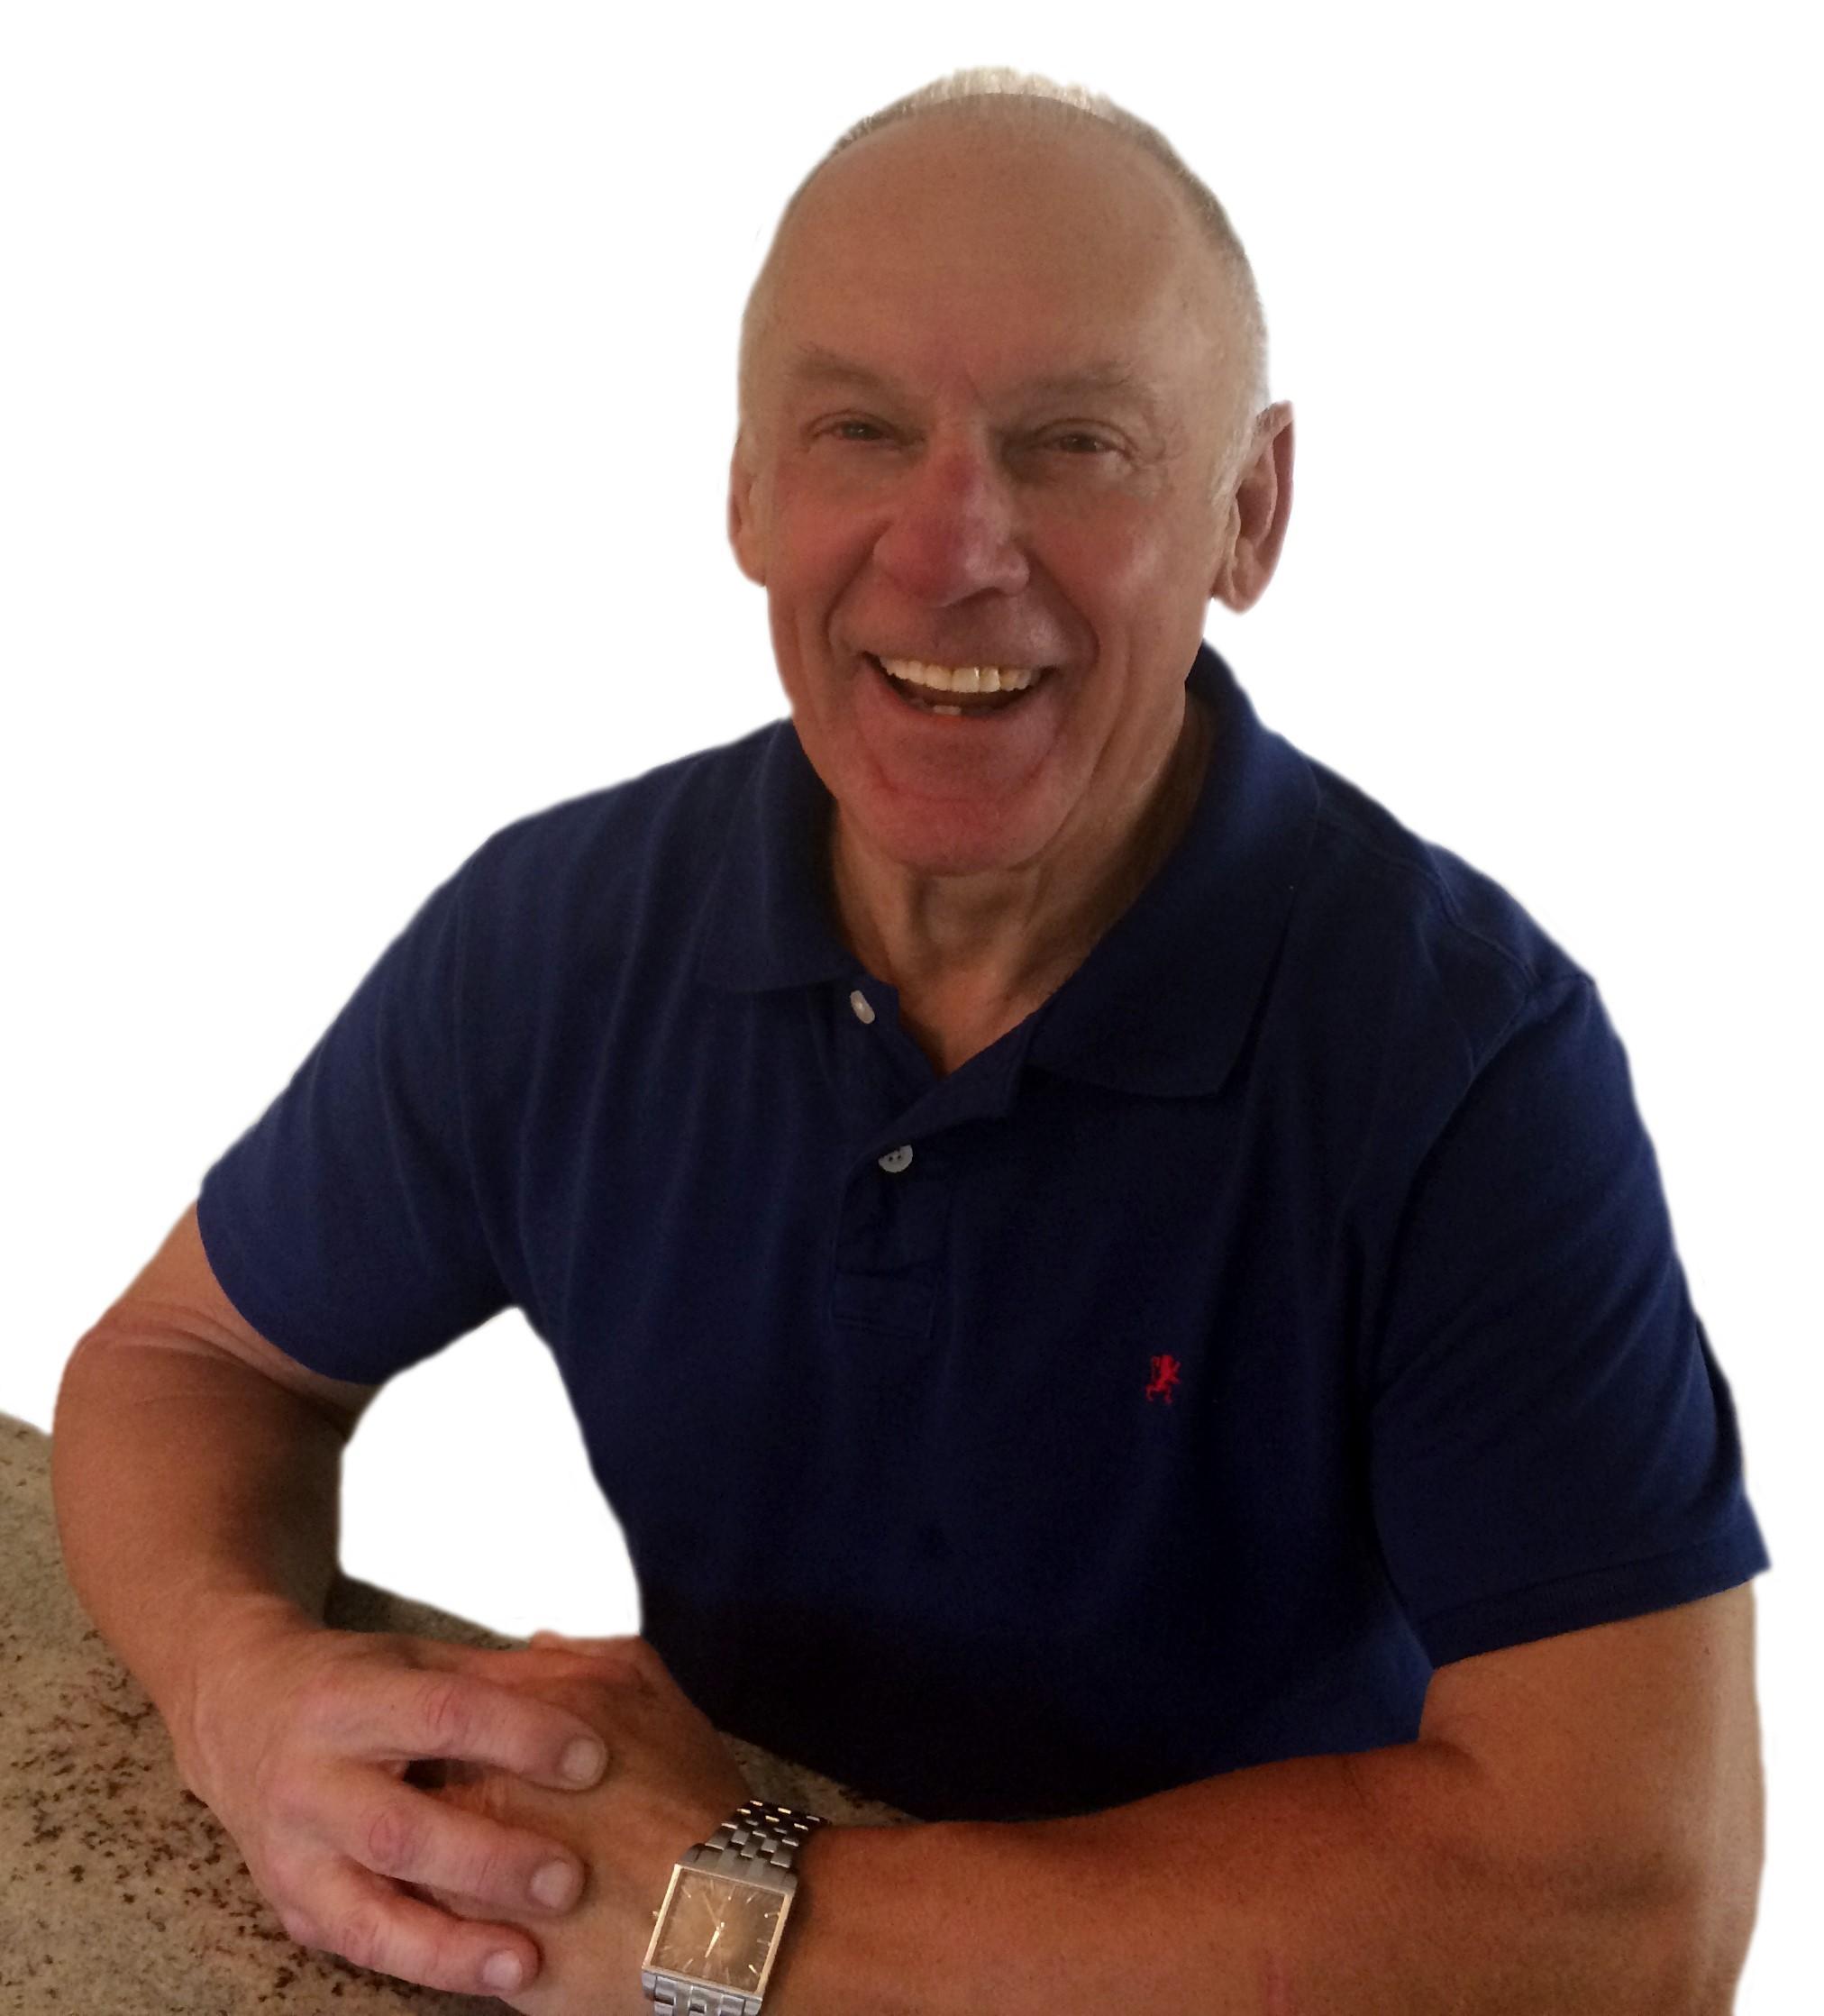 Bill Dougal